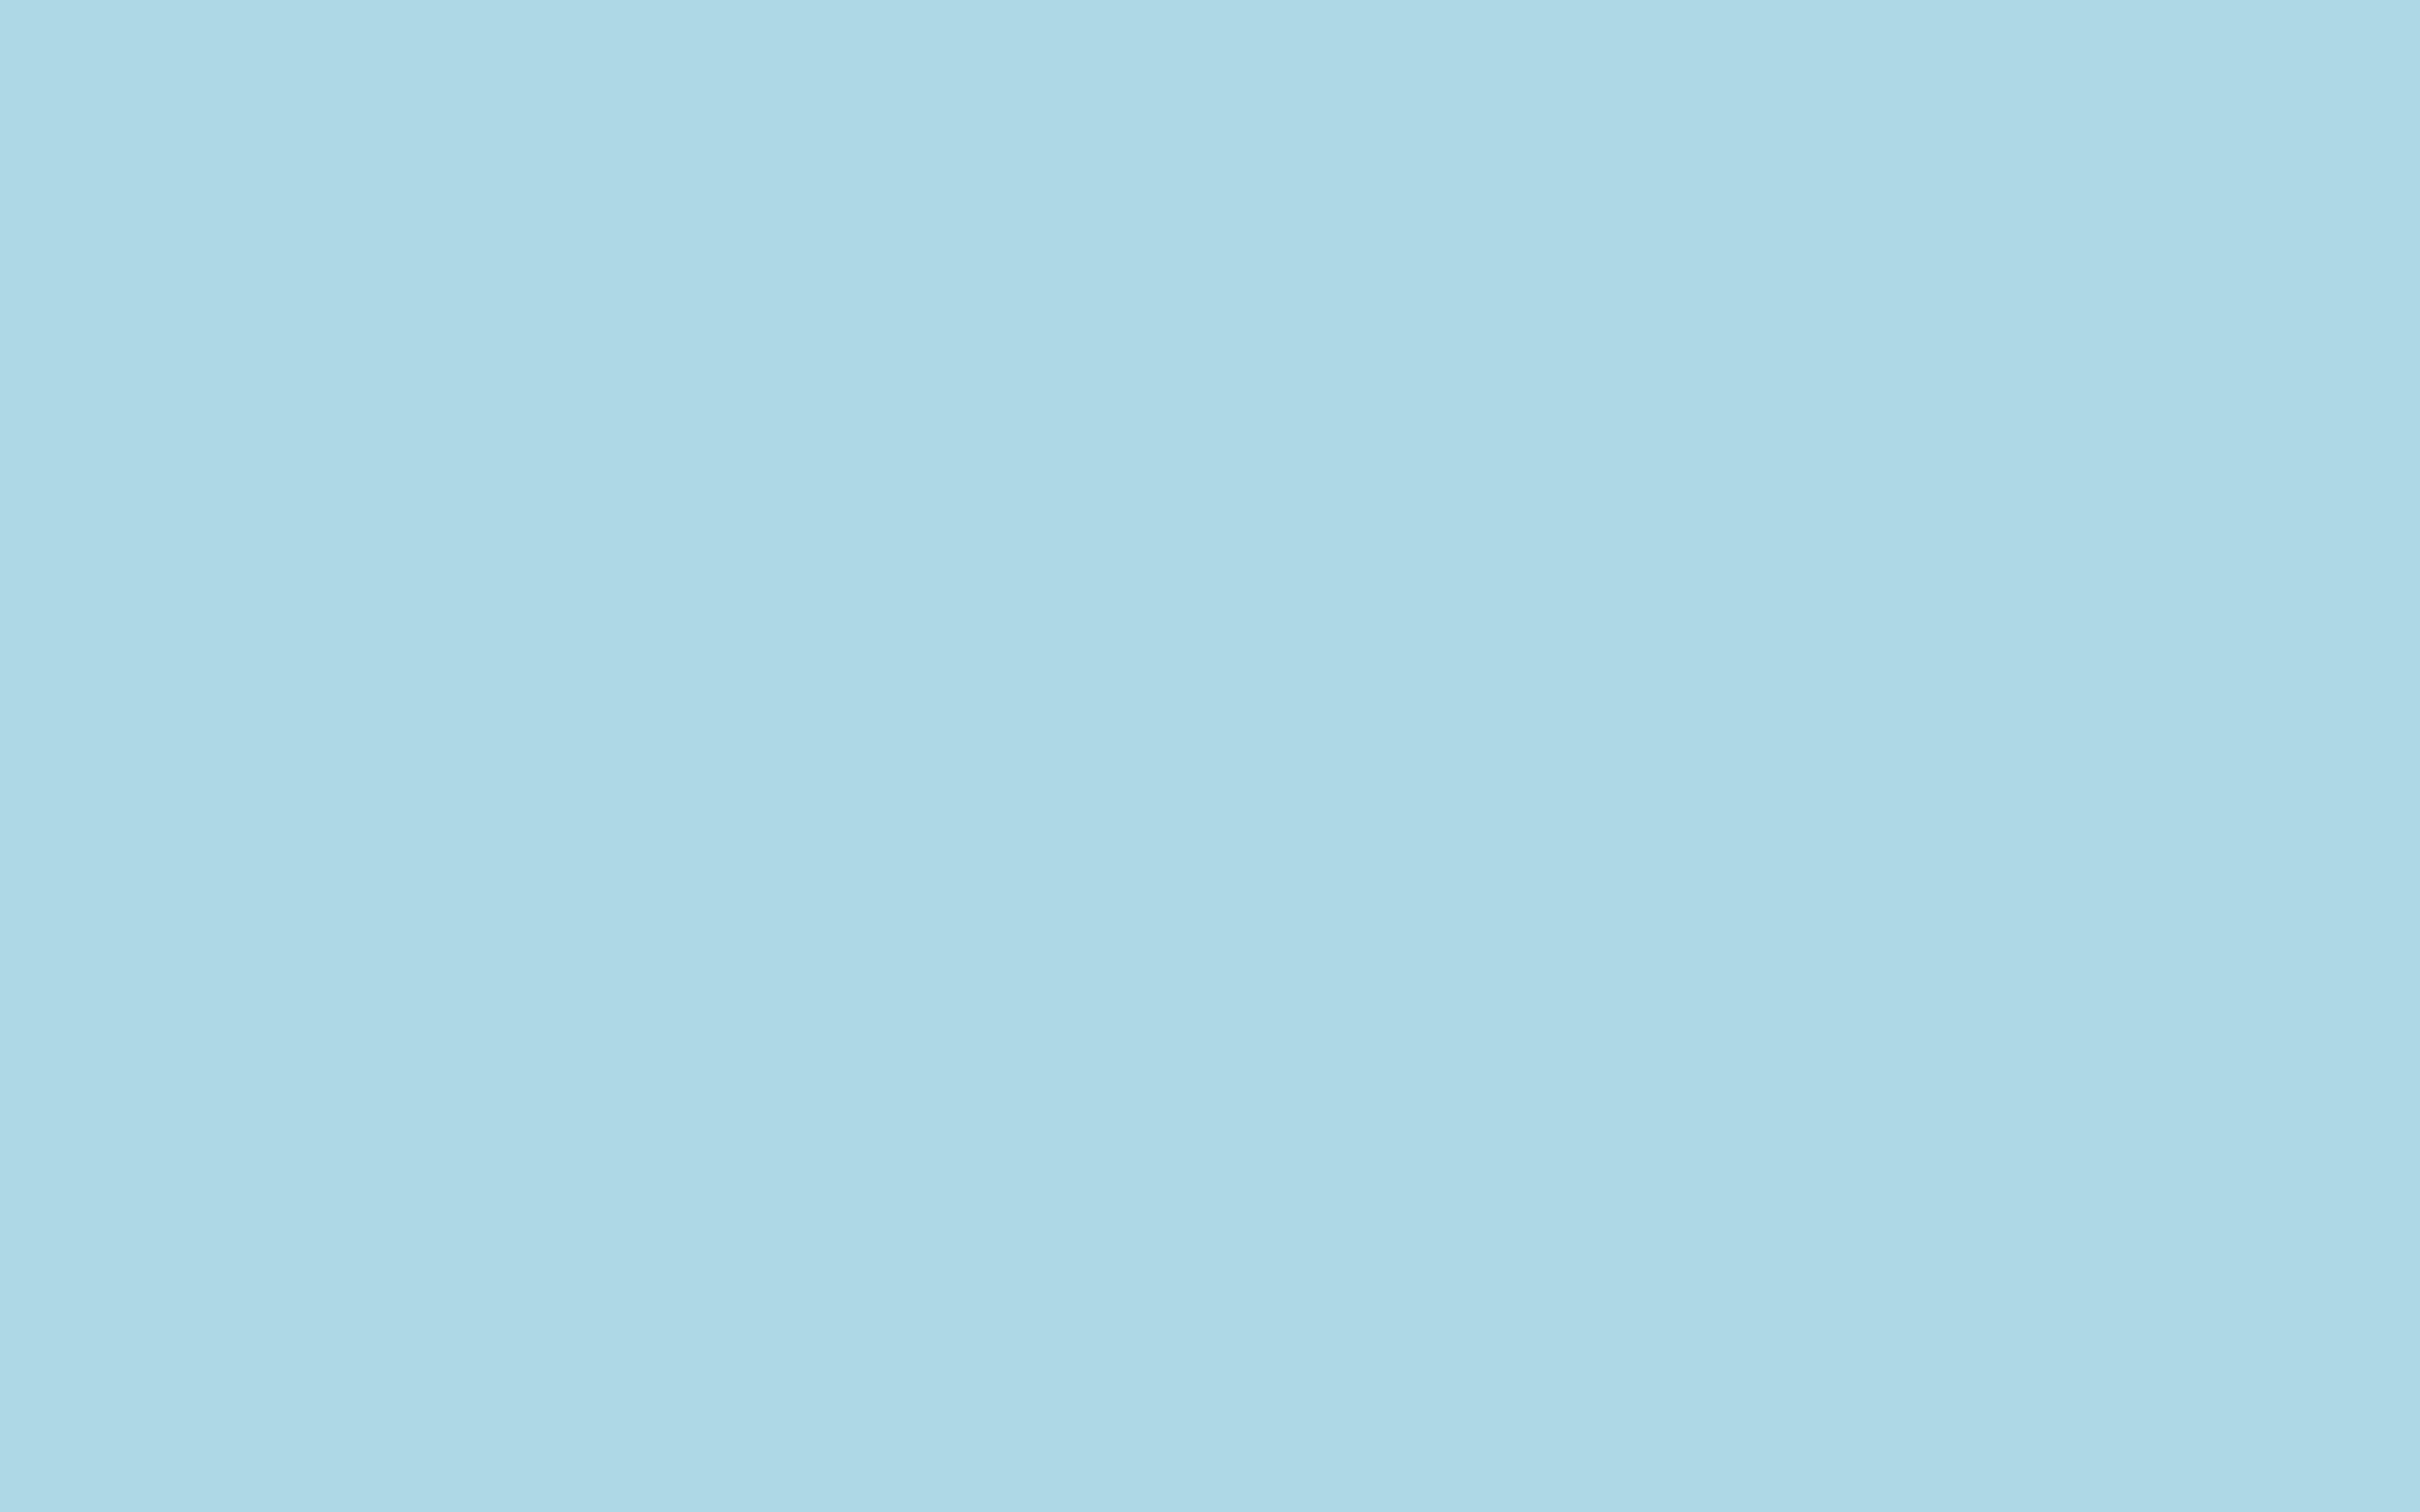 Light Blue Wallpaper 77 Images